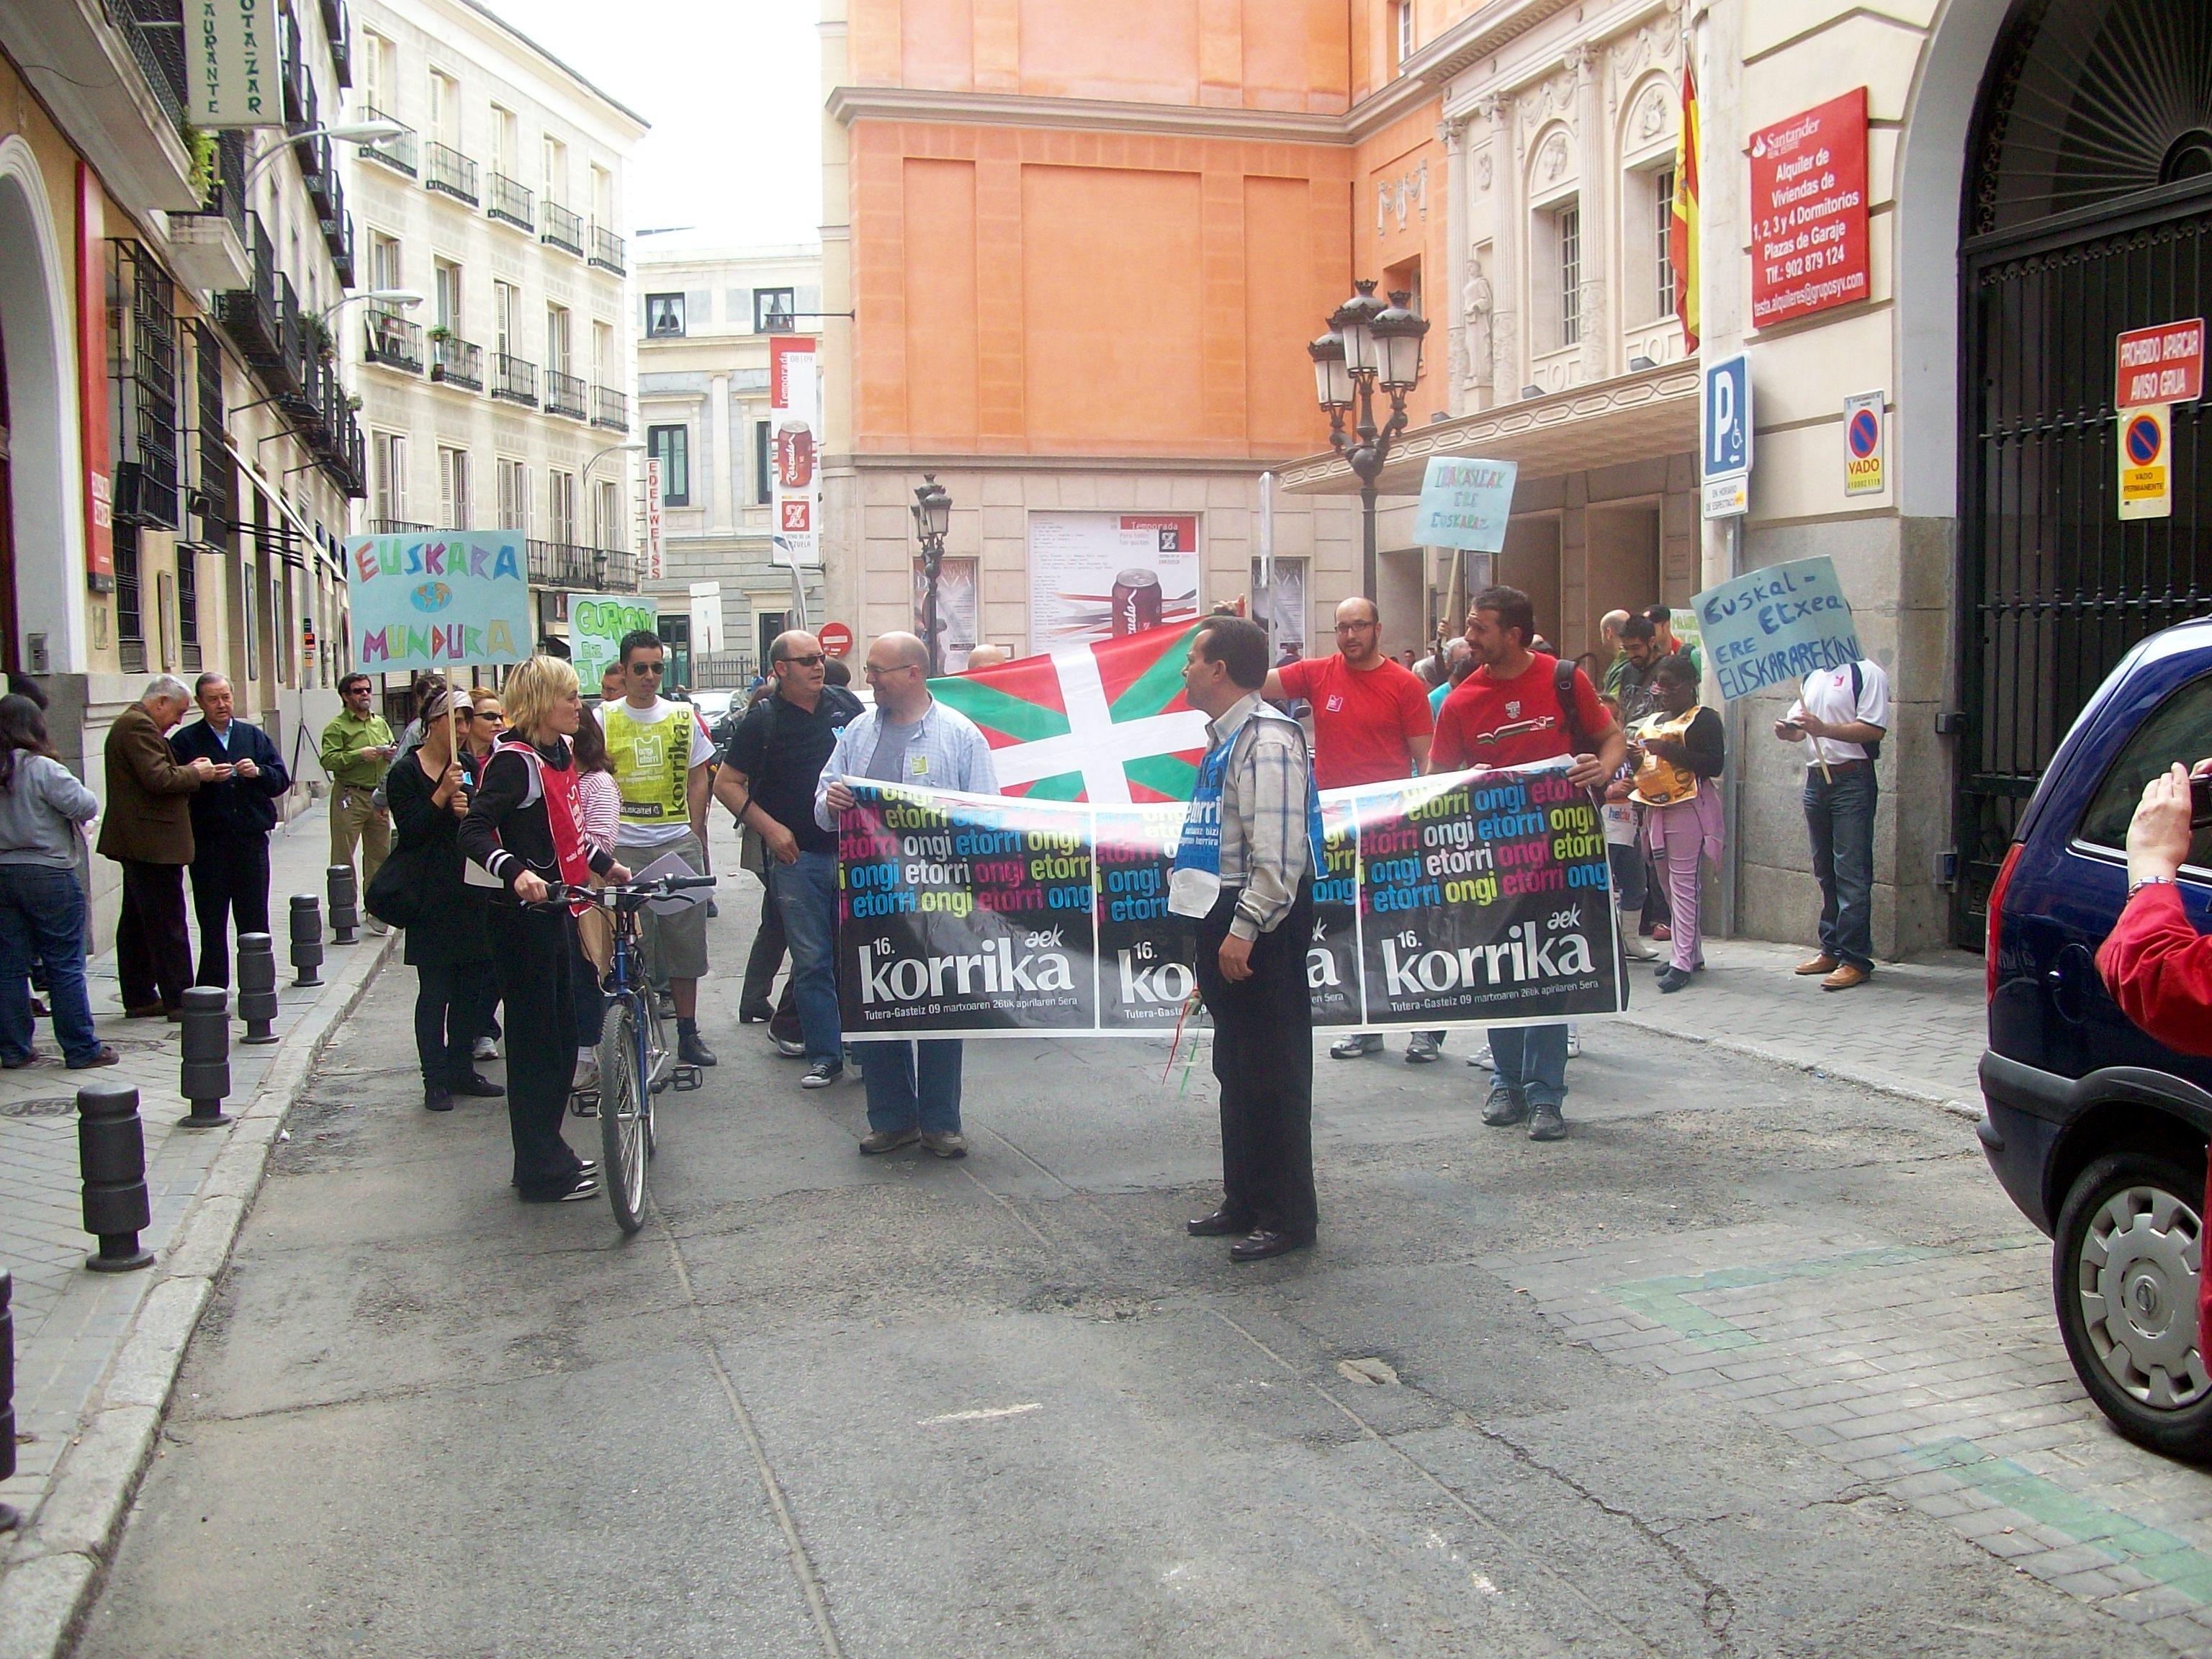 Korrika 16 in Madrid